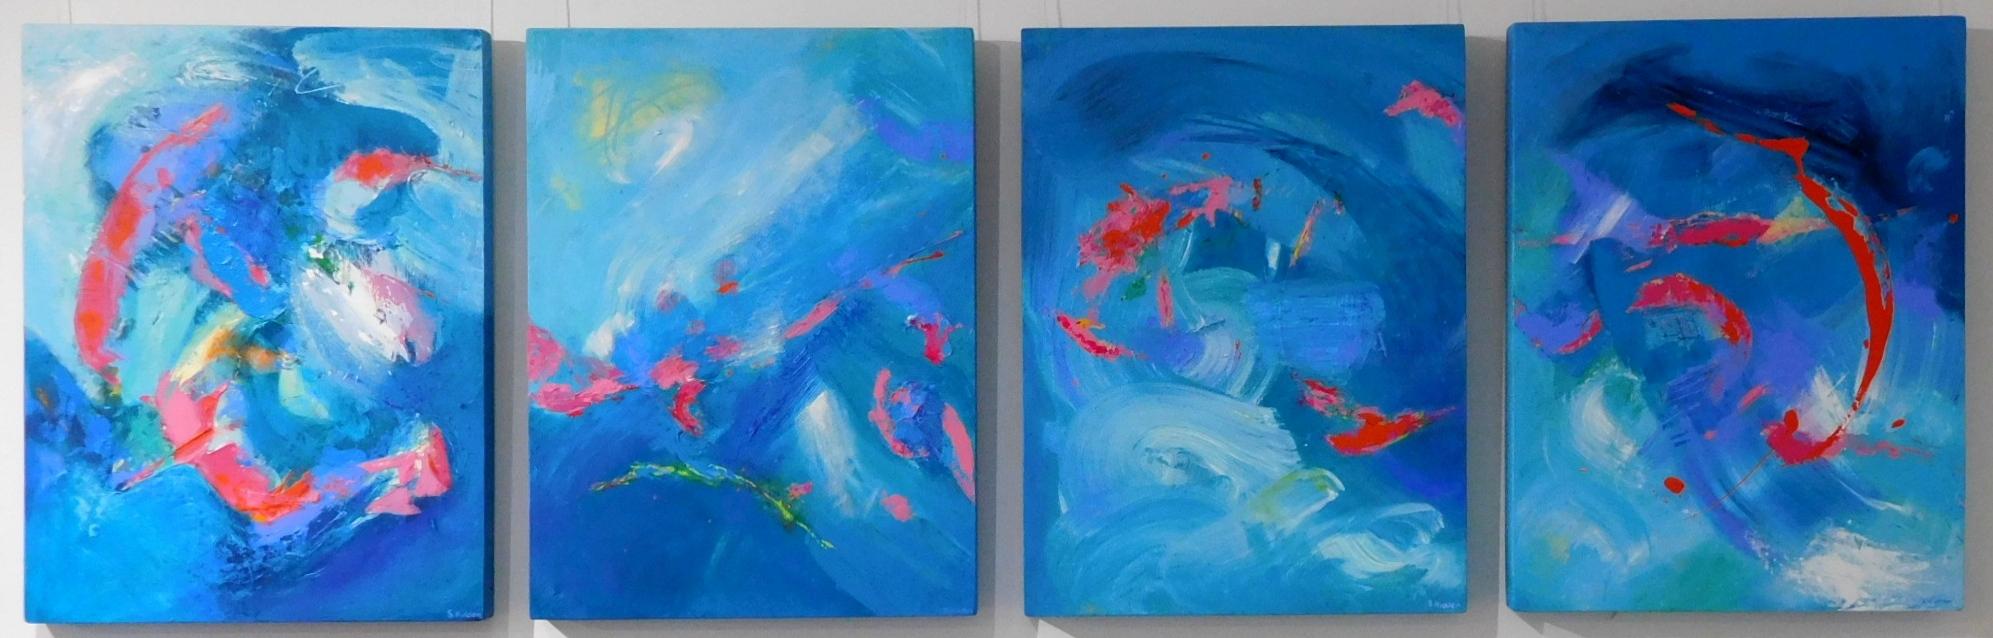 Teal Abstract Art Uk